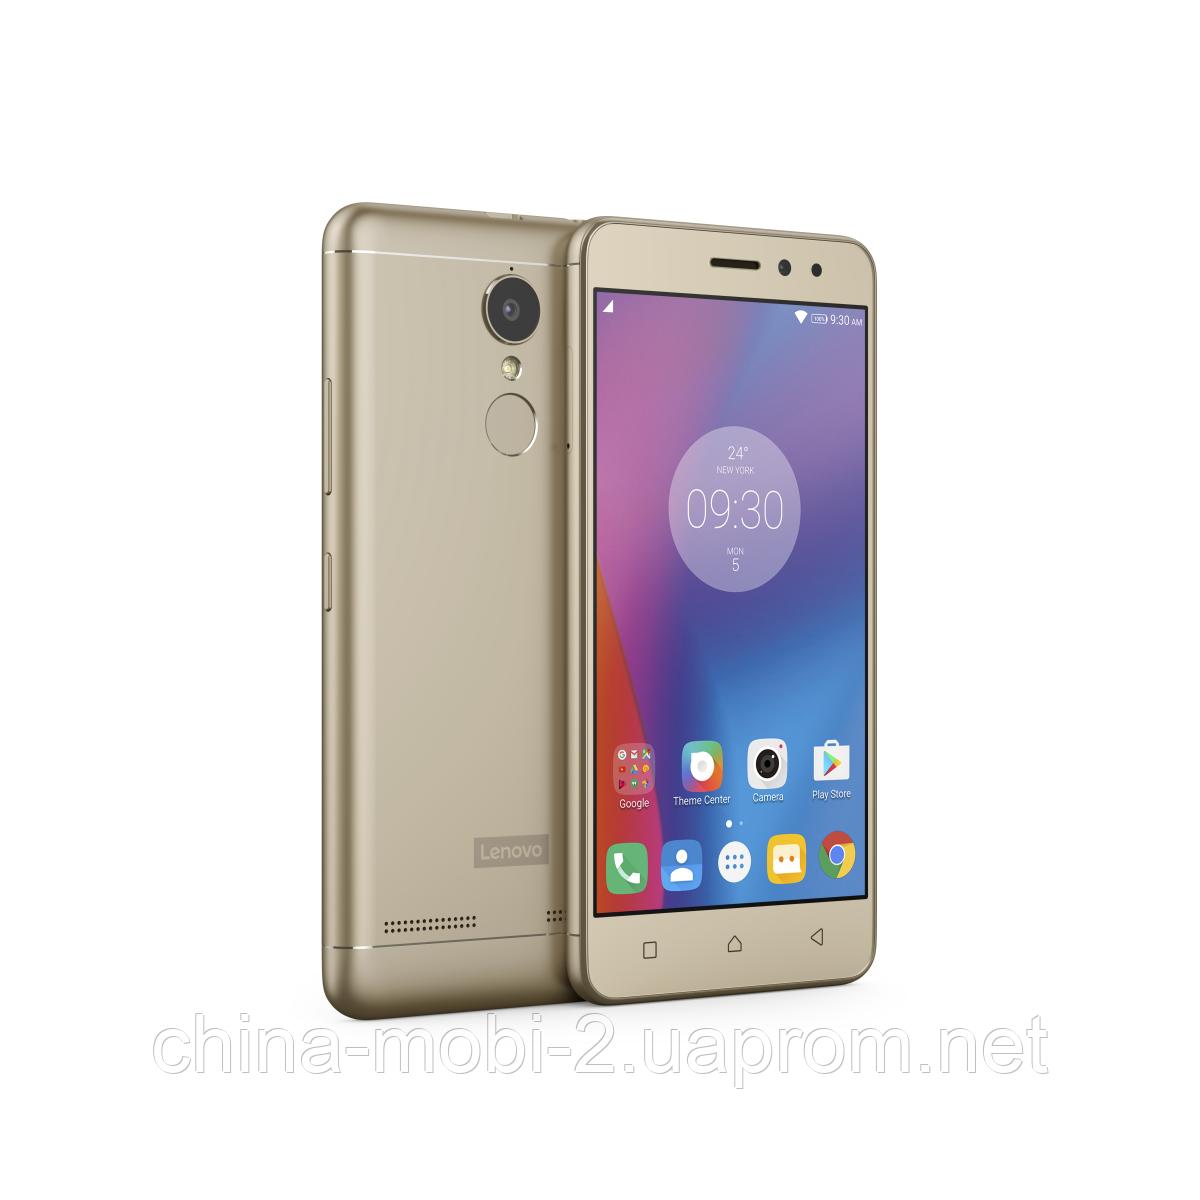 Смартфон Lenovo VIBE K6  K33a48  16GB Octa core Gold